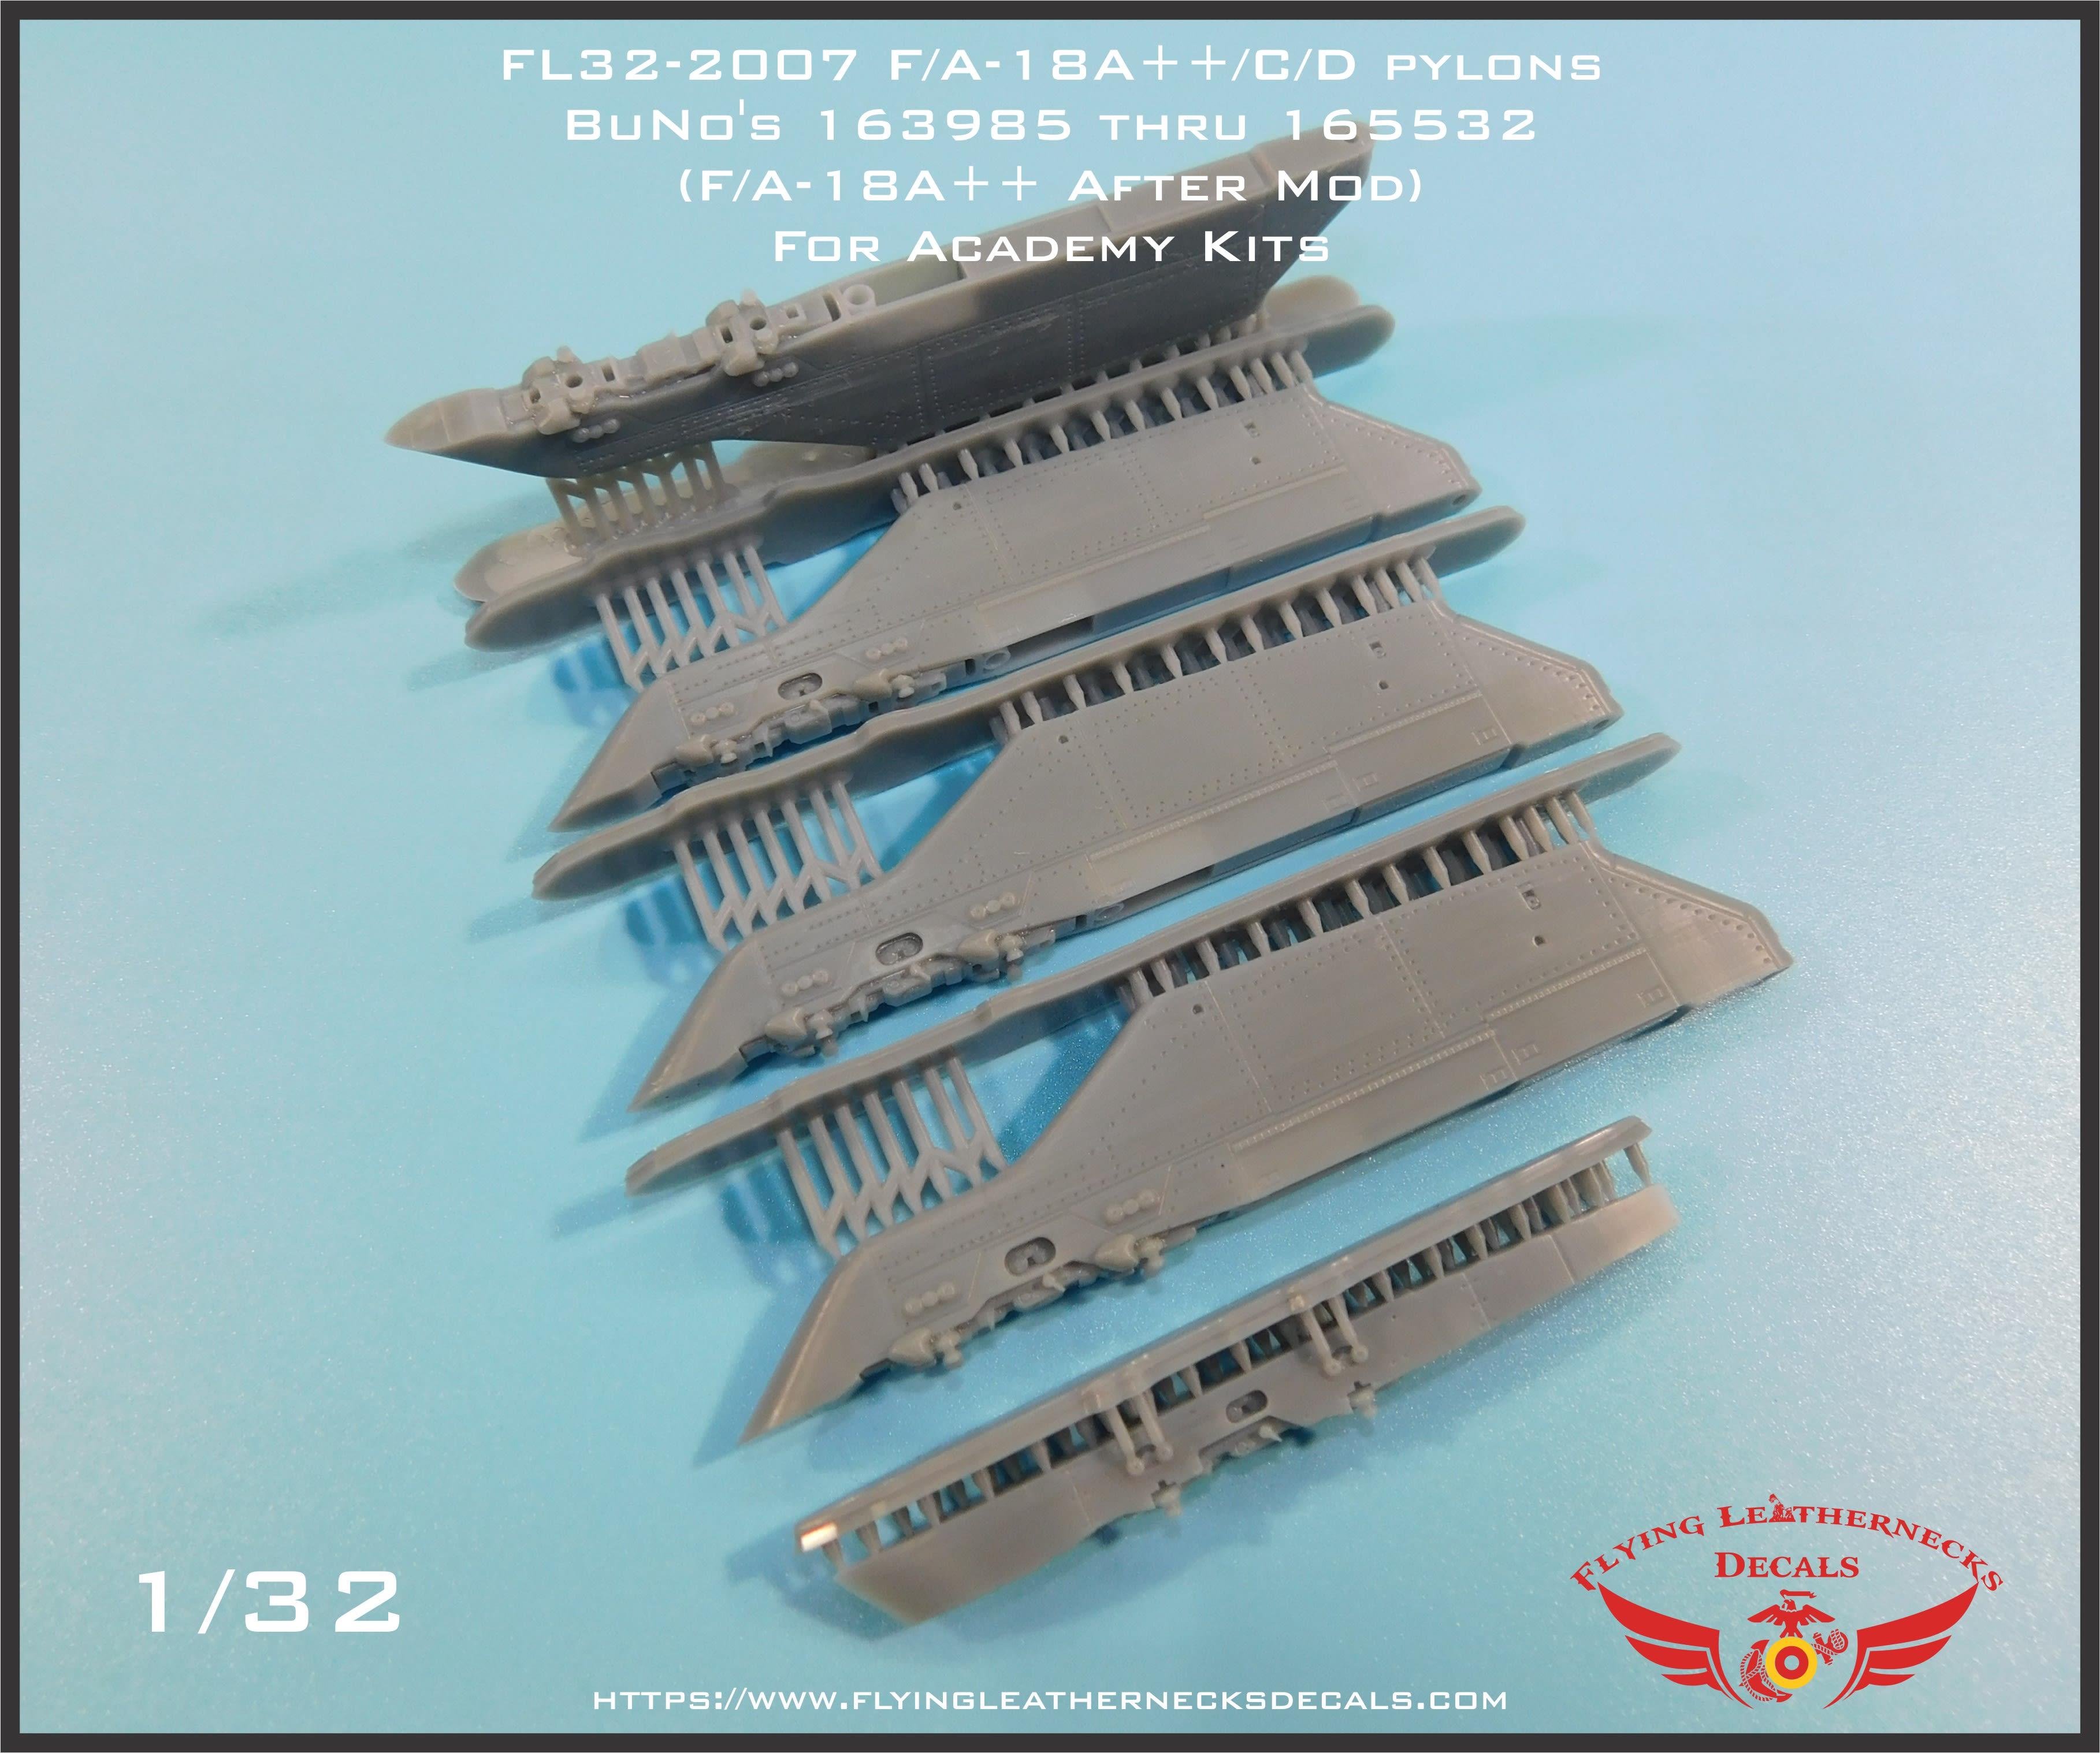 FL32-2007